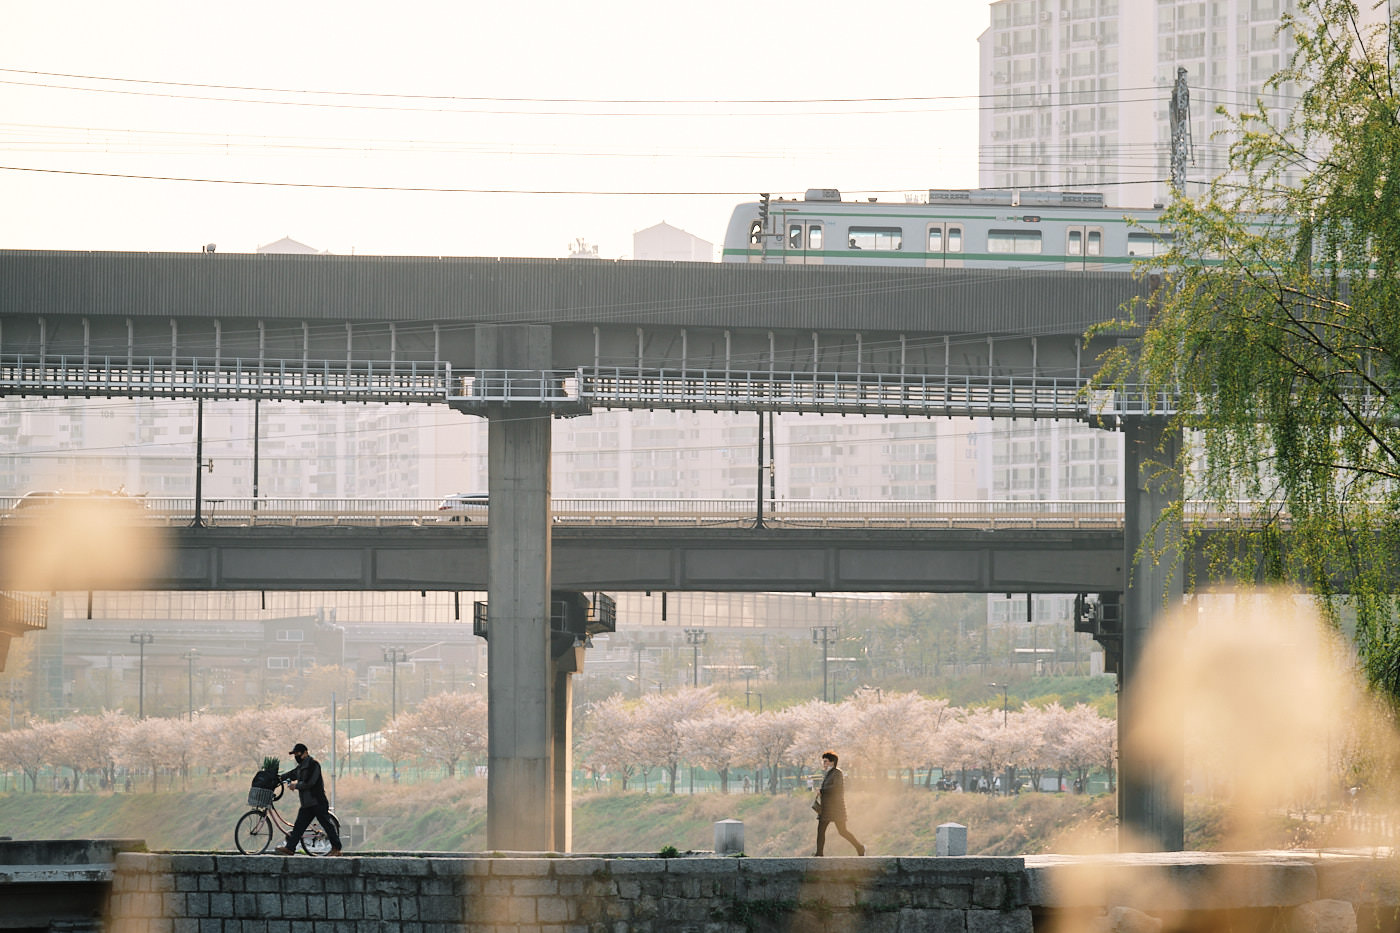 Seoul - Social Distancing